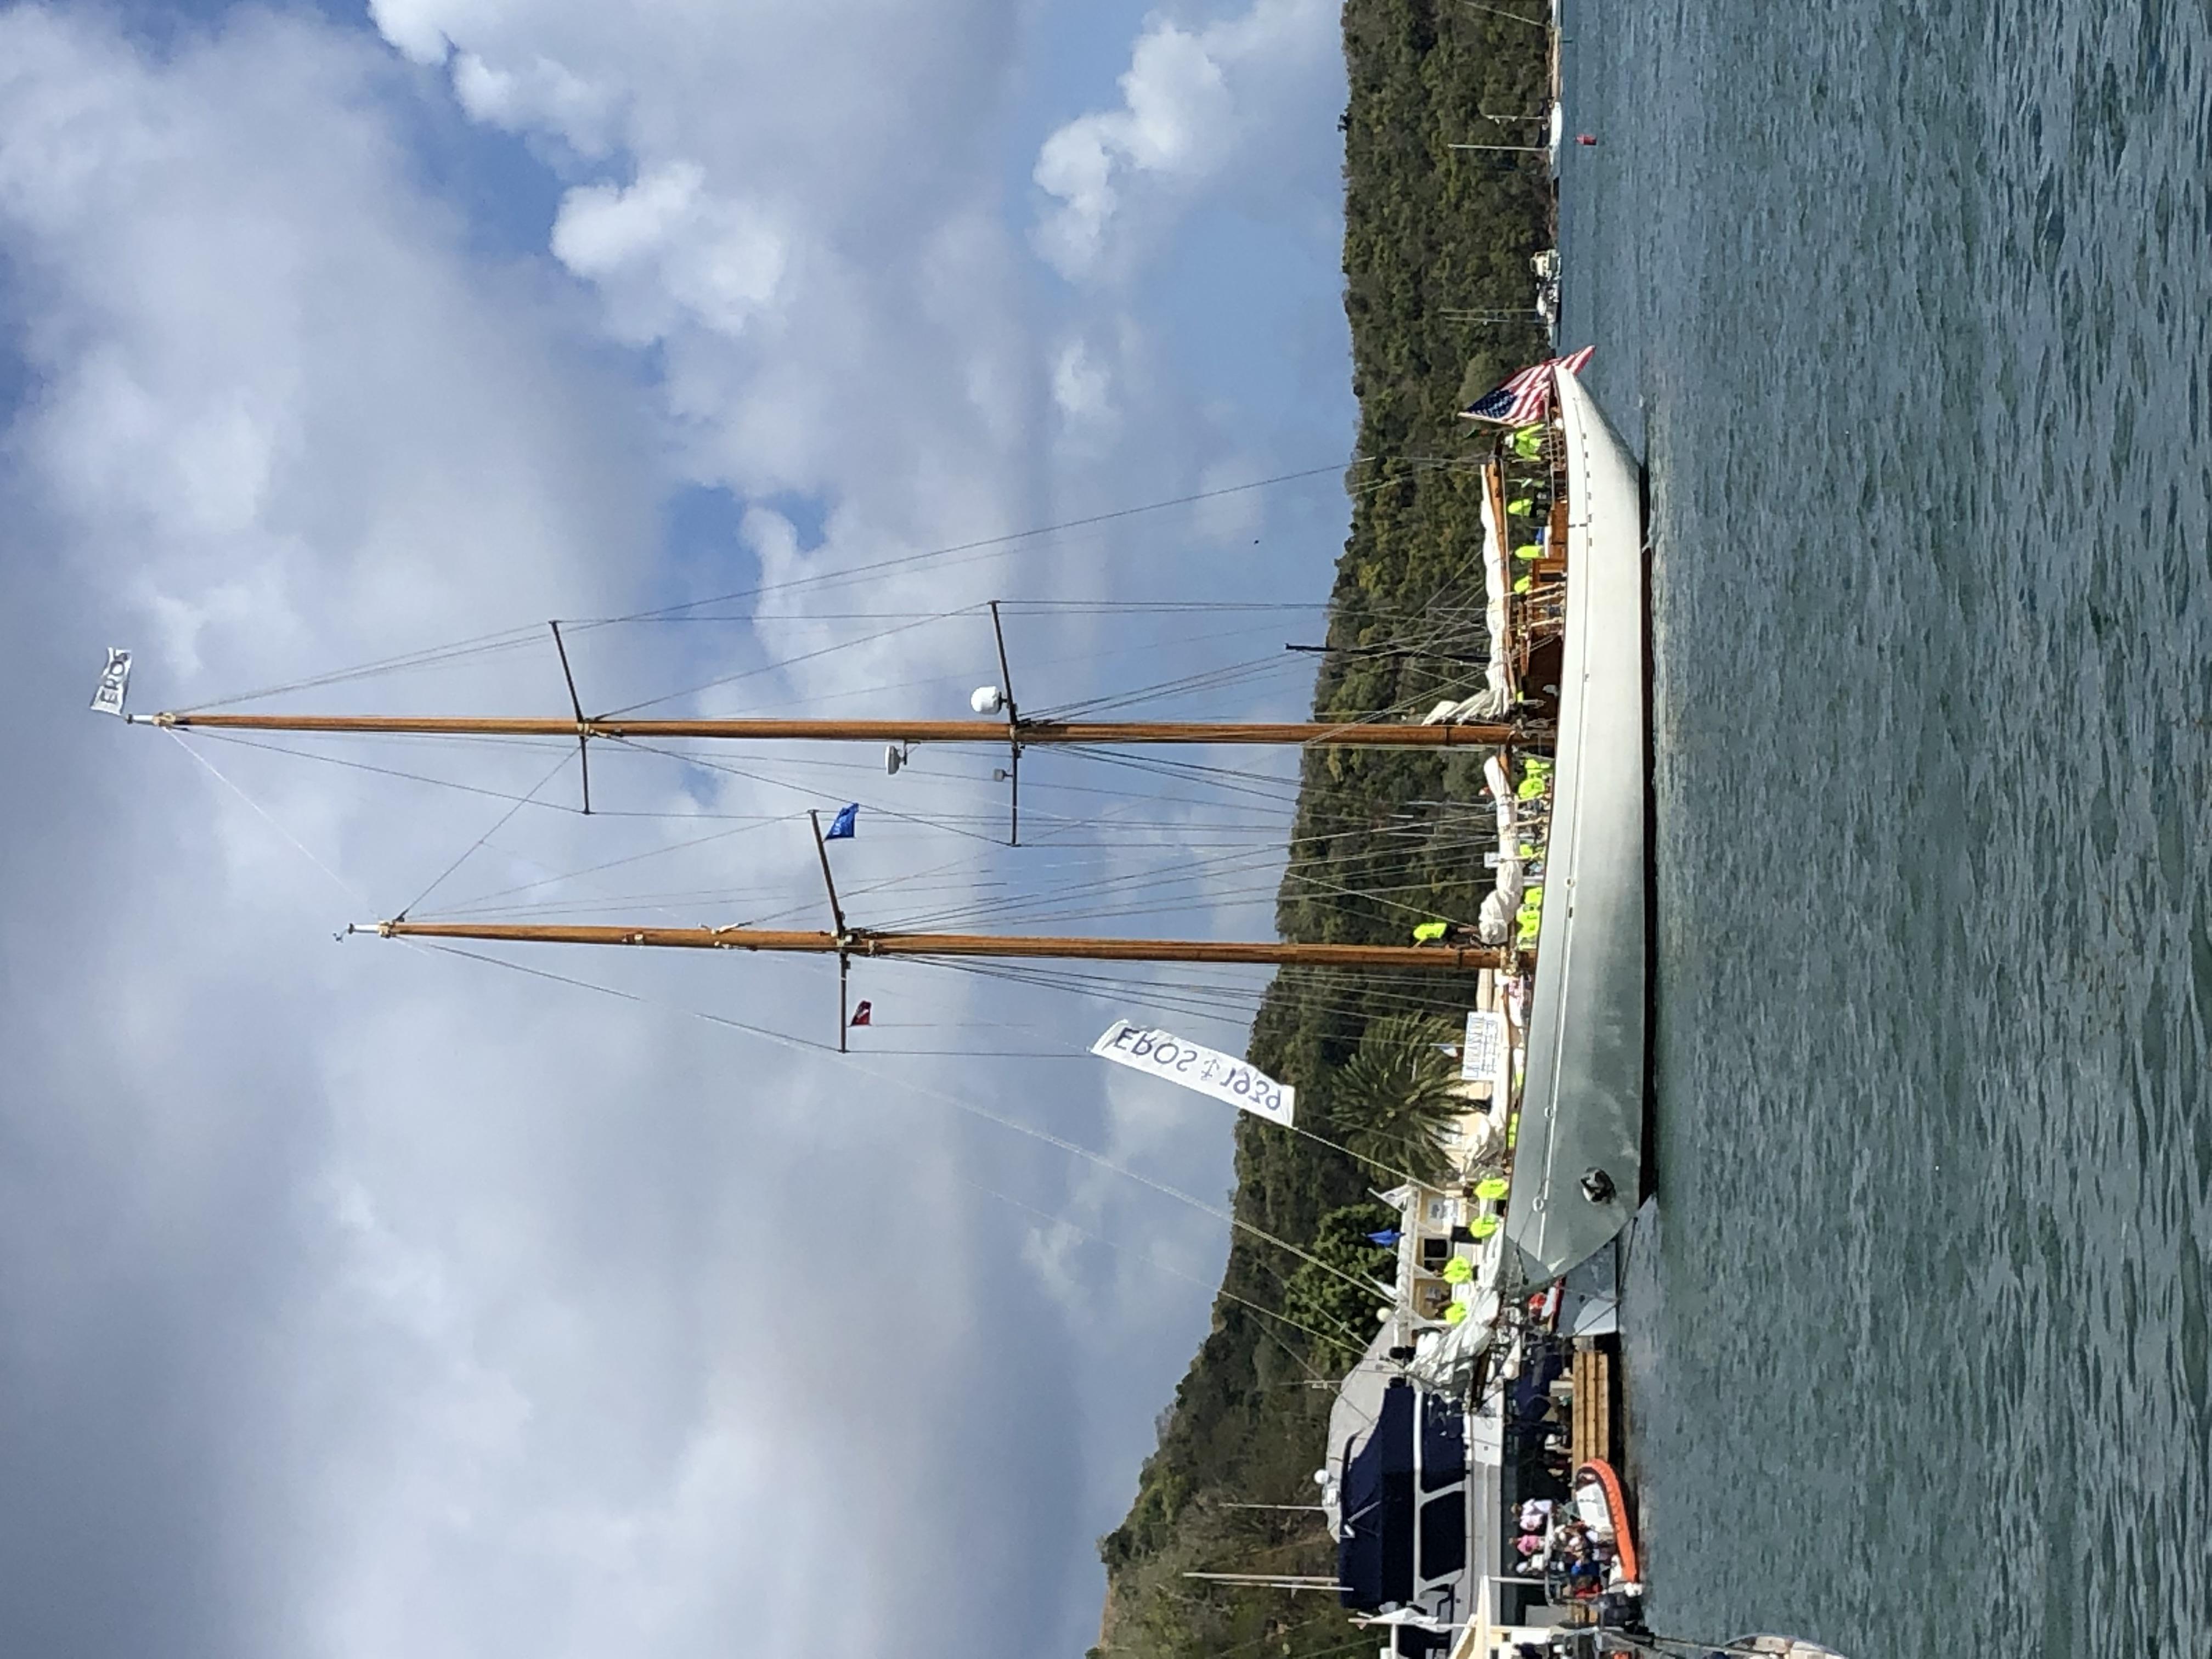 Eros - 103ft Staysail Schooner